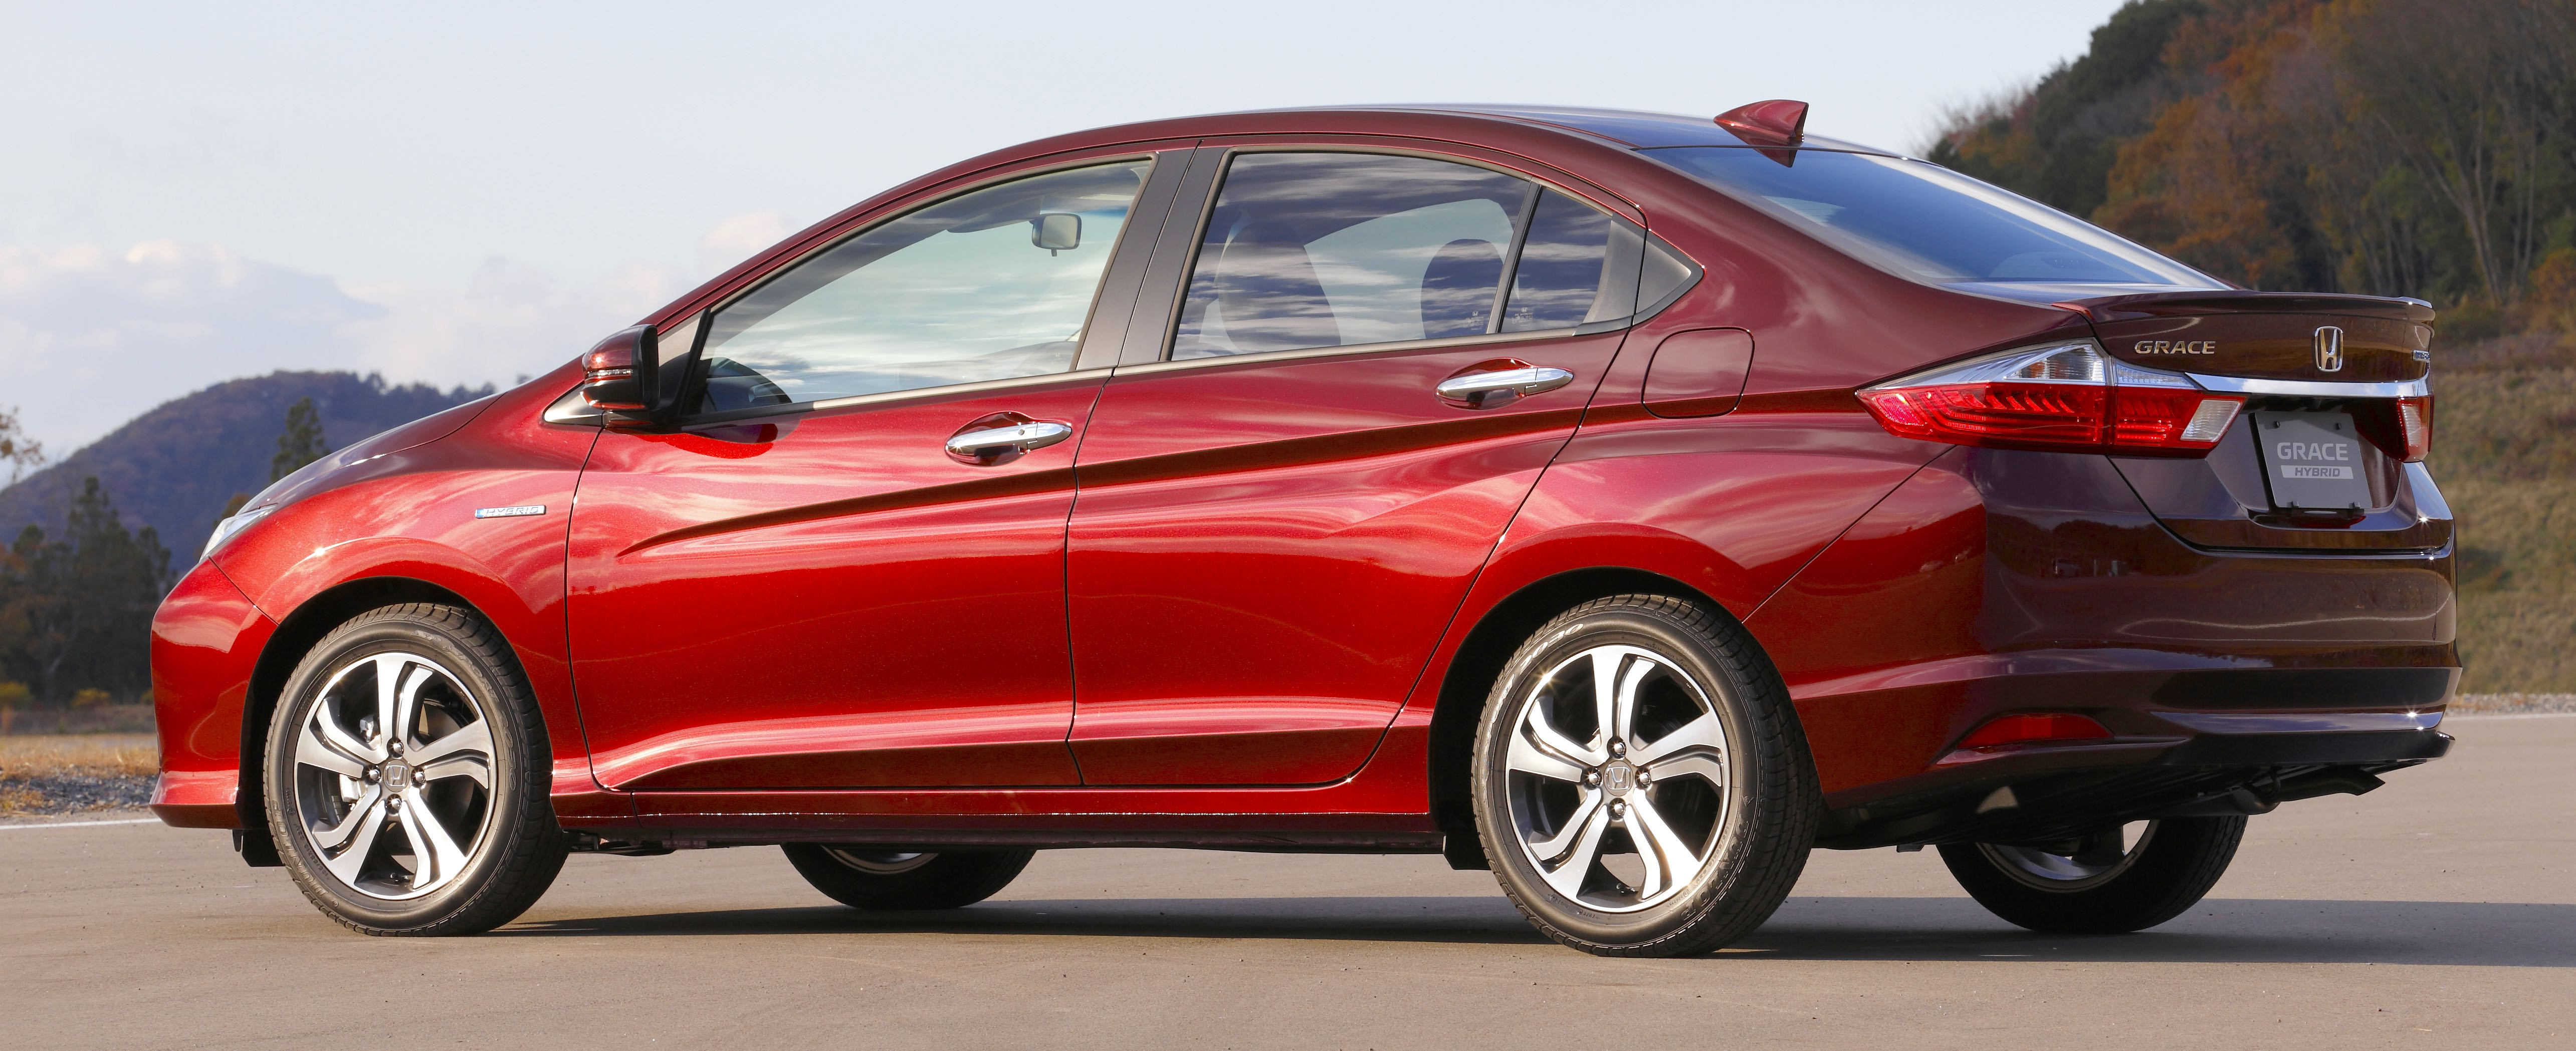 CarNichiWa New Honda Grace Hybrid Preview Sedan Goes On Sale - American honda